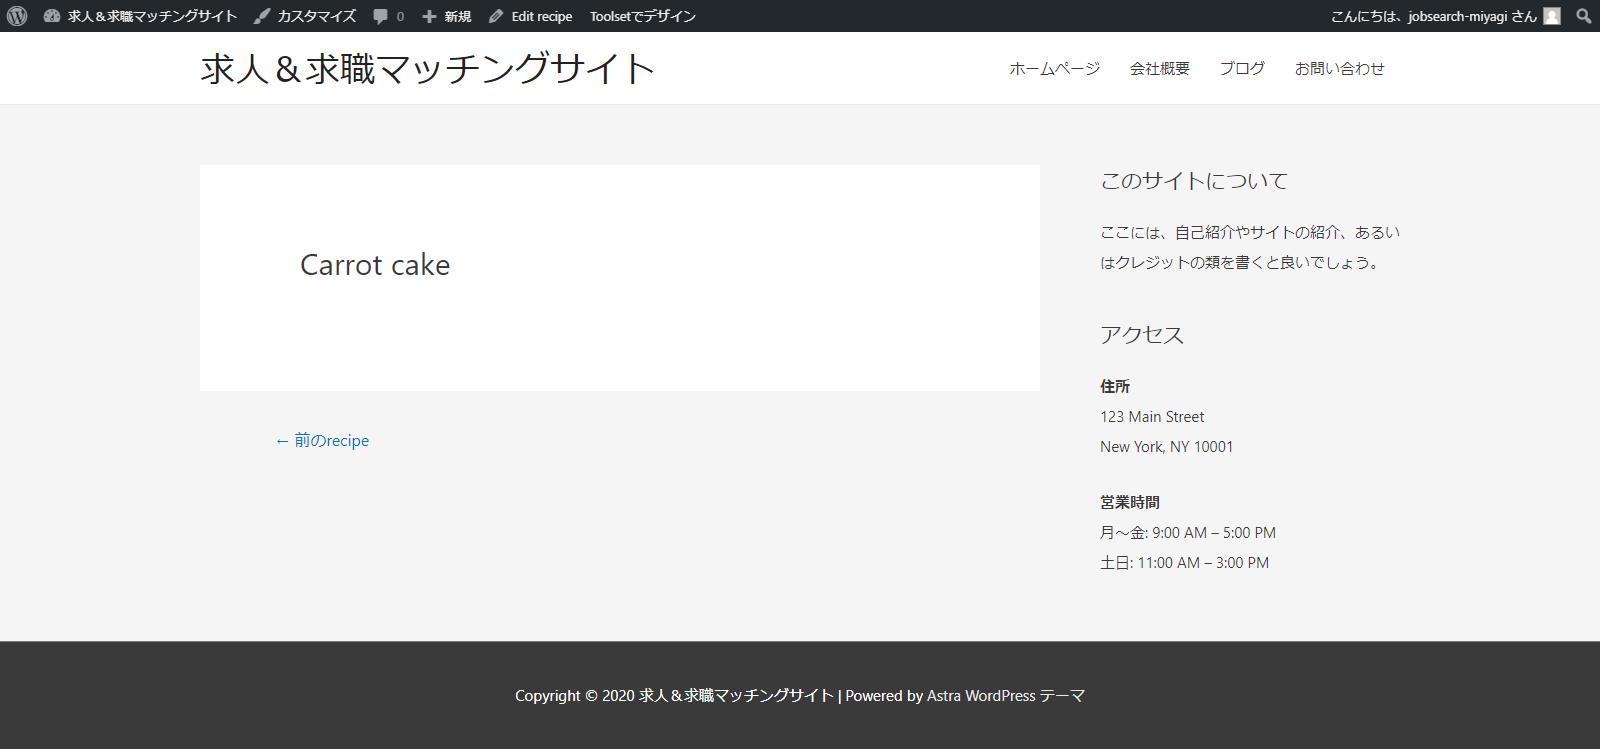 screencapture-jobsearch-miyagi-2020-06-23-21_15_10.png